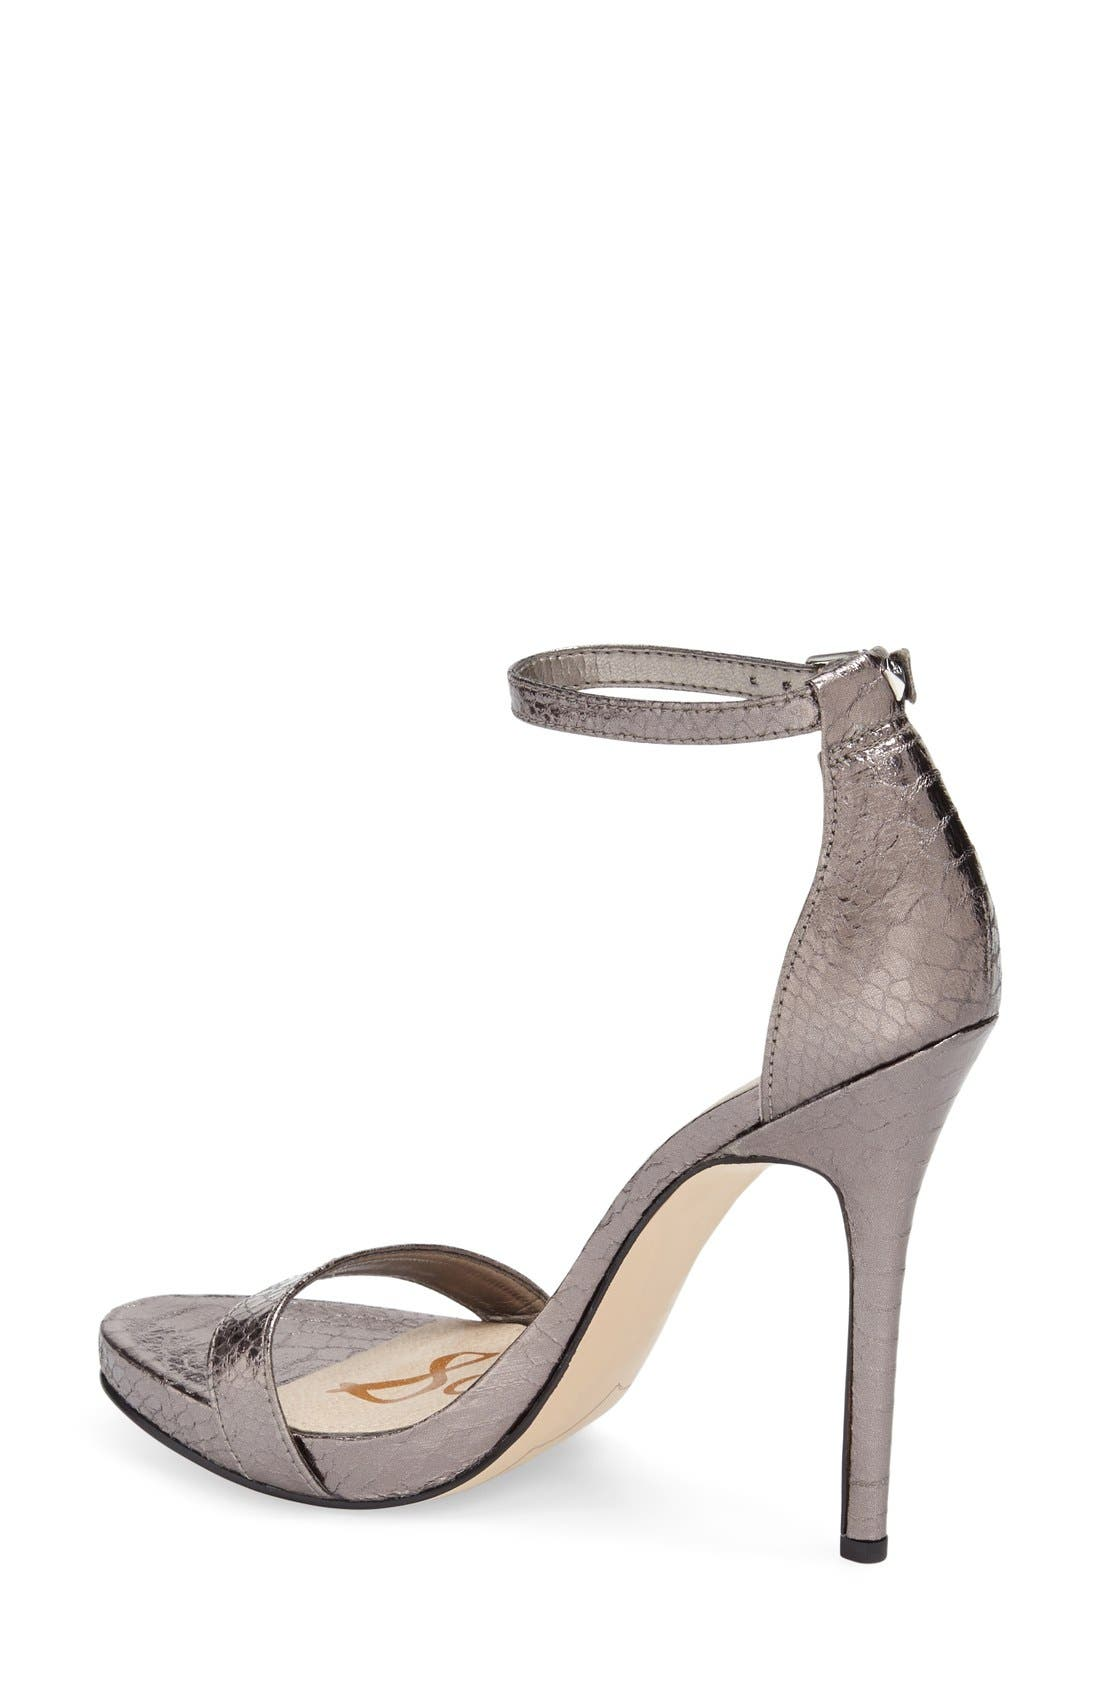 ,                             'Eleanor' Ankle Strap Sandal,                             Alternate thumbnail 51, color,                             020